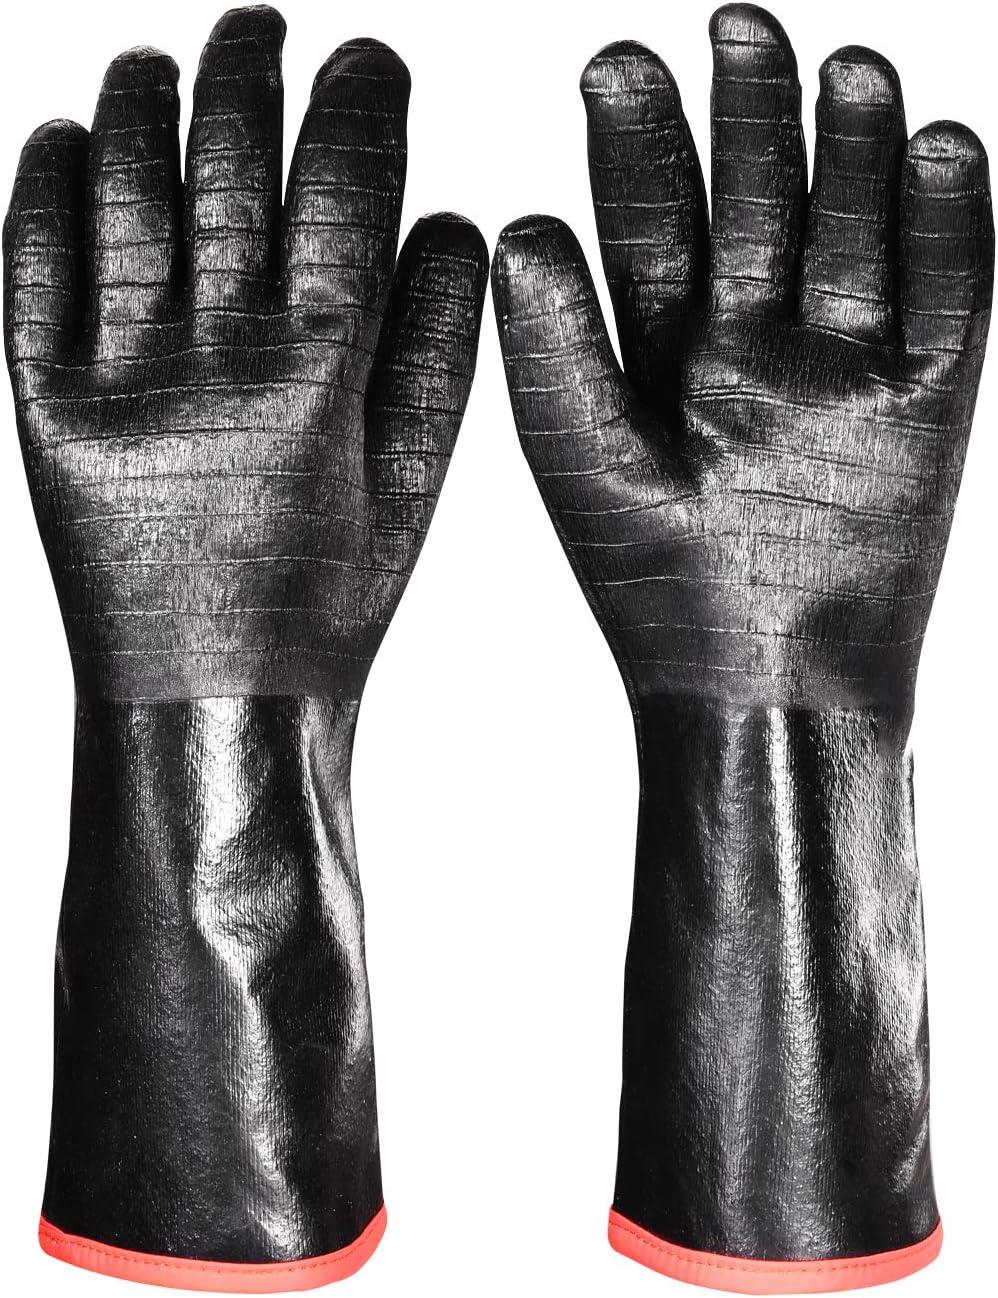 iHarbort Best Cotton Gloves for BBQ